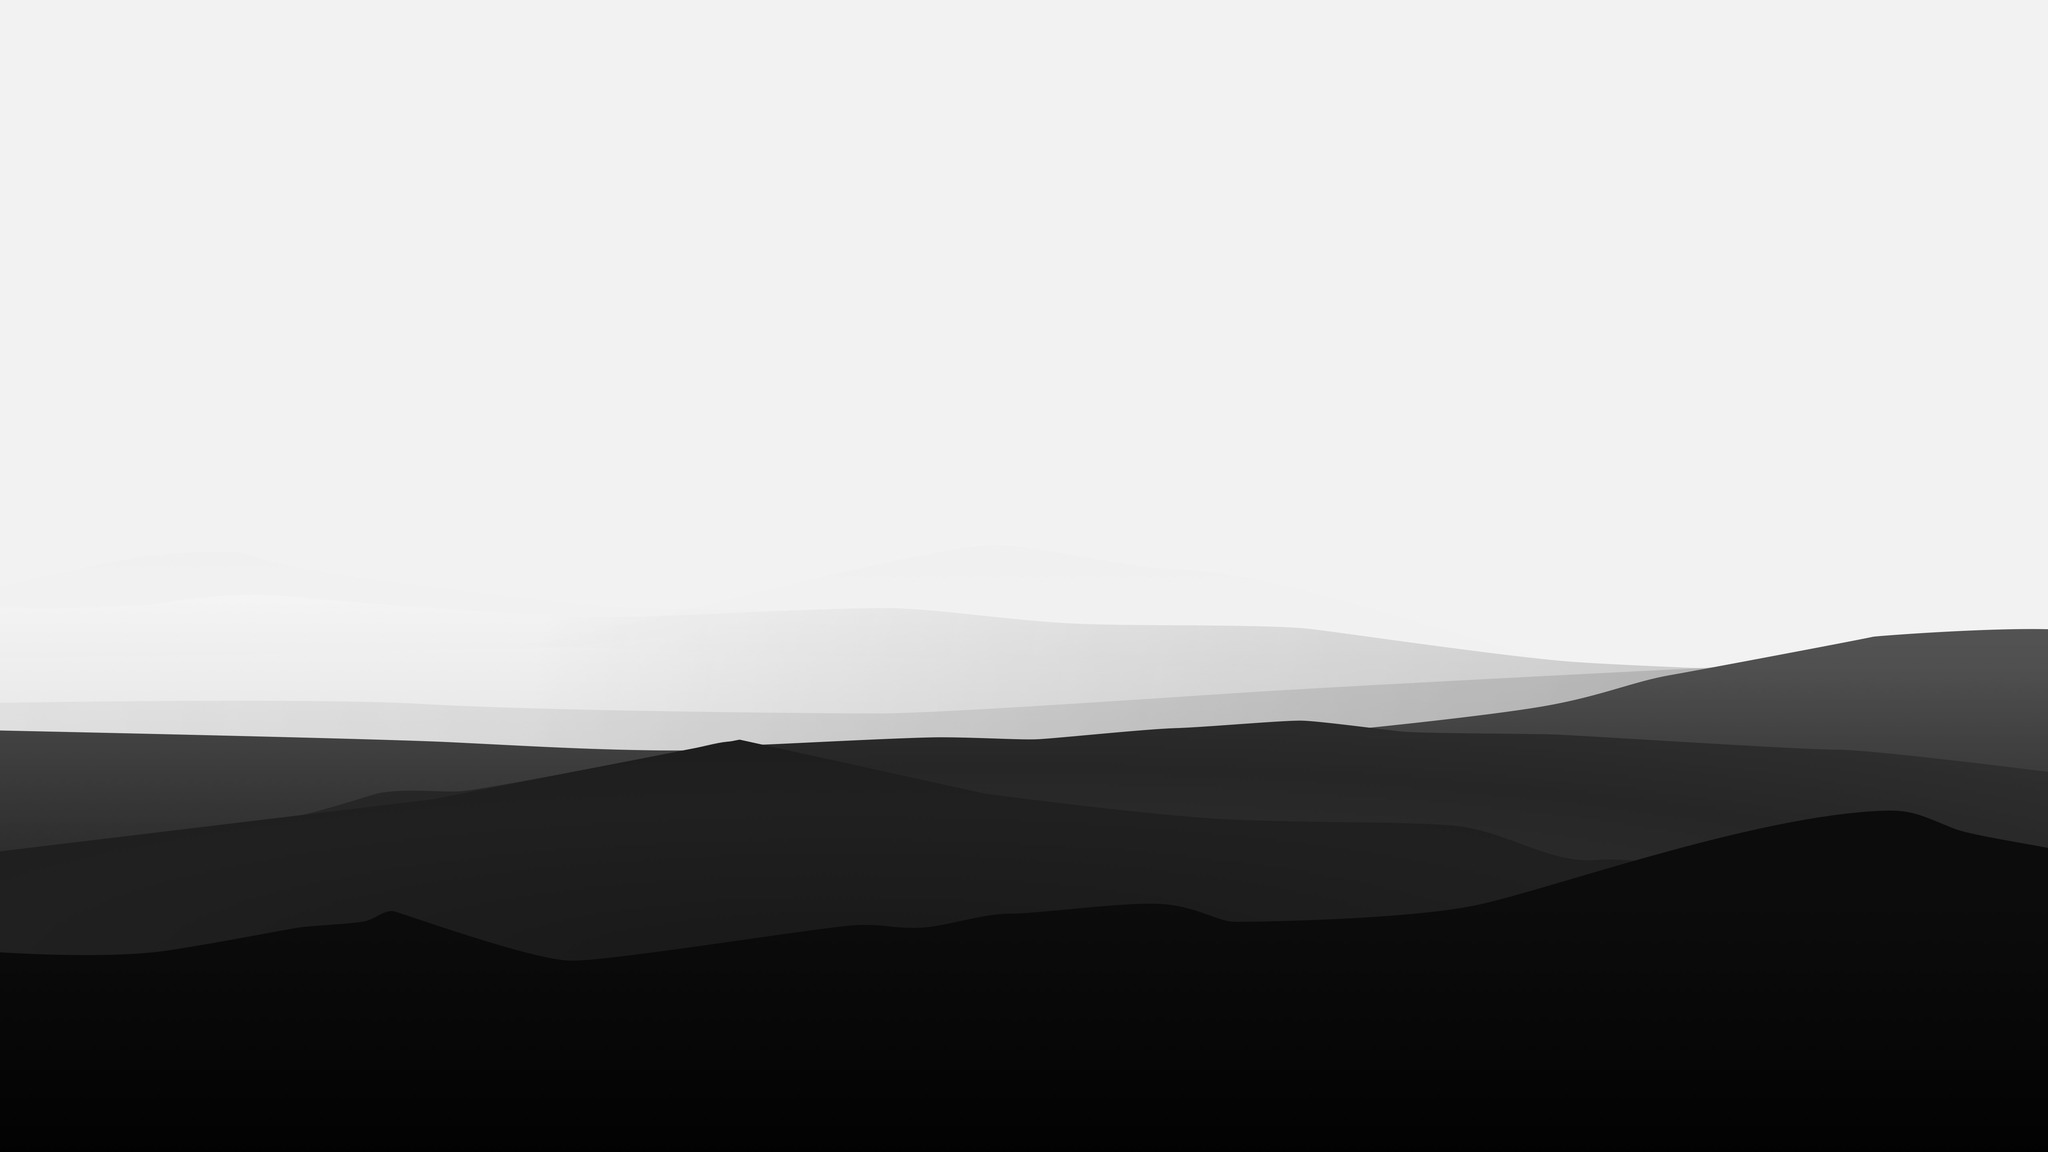 Great Wallpaper Black And White Minimalist - minimalist-mountains-black-and-white-ap-2048x1152  Graphic_77688.jpg